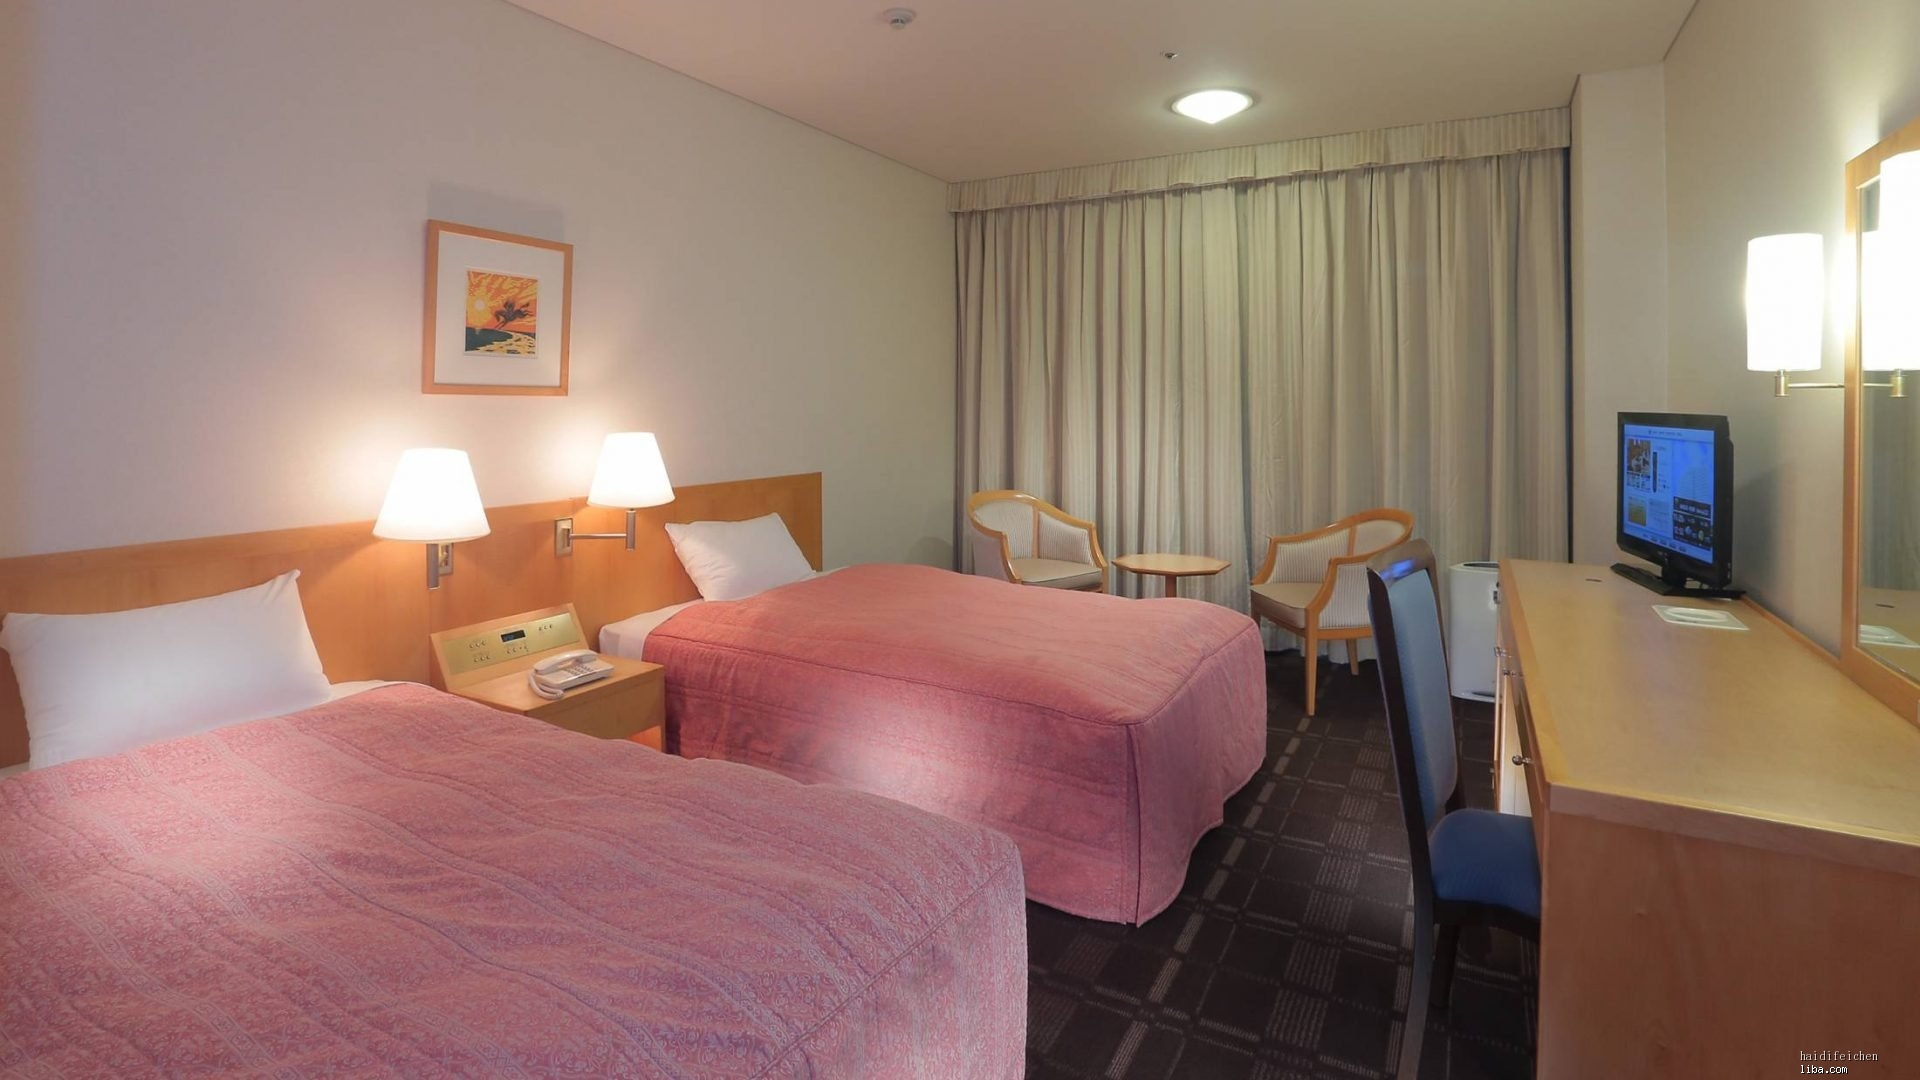 superior-twin-room-kansai-airport-washington-hotel-osaka-1920x1080.jpg